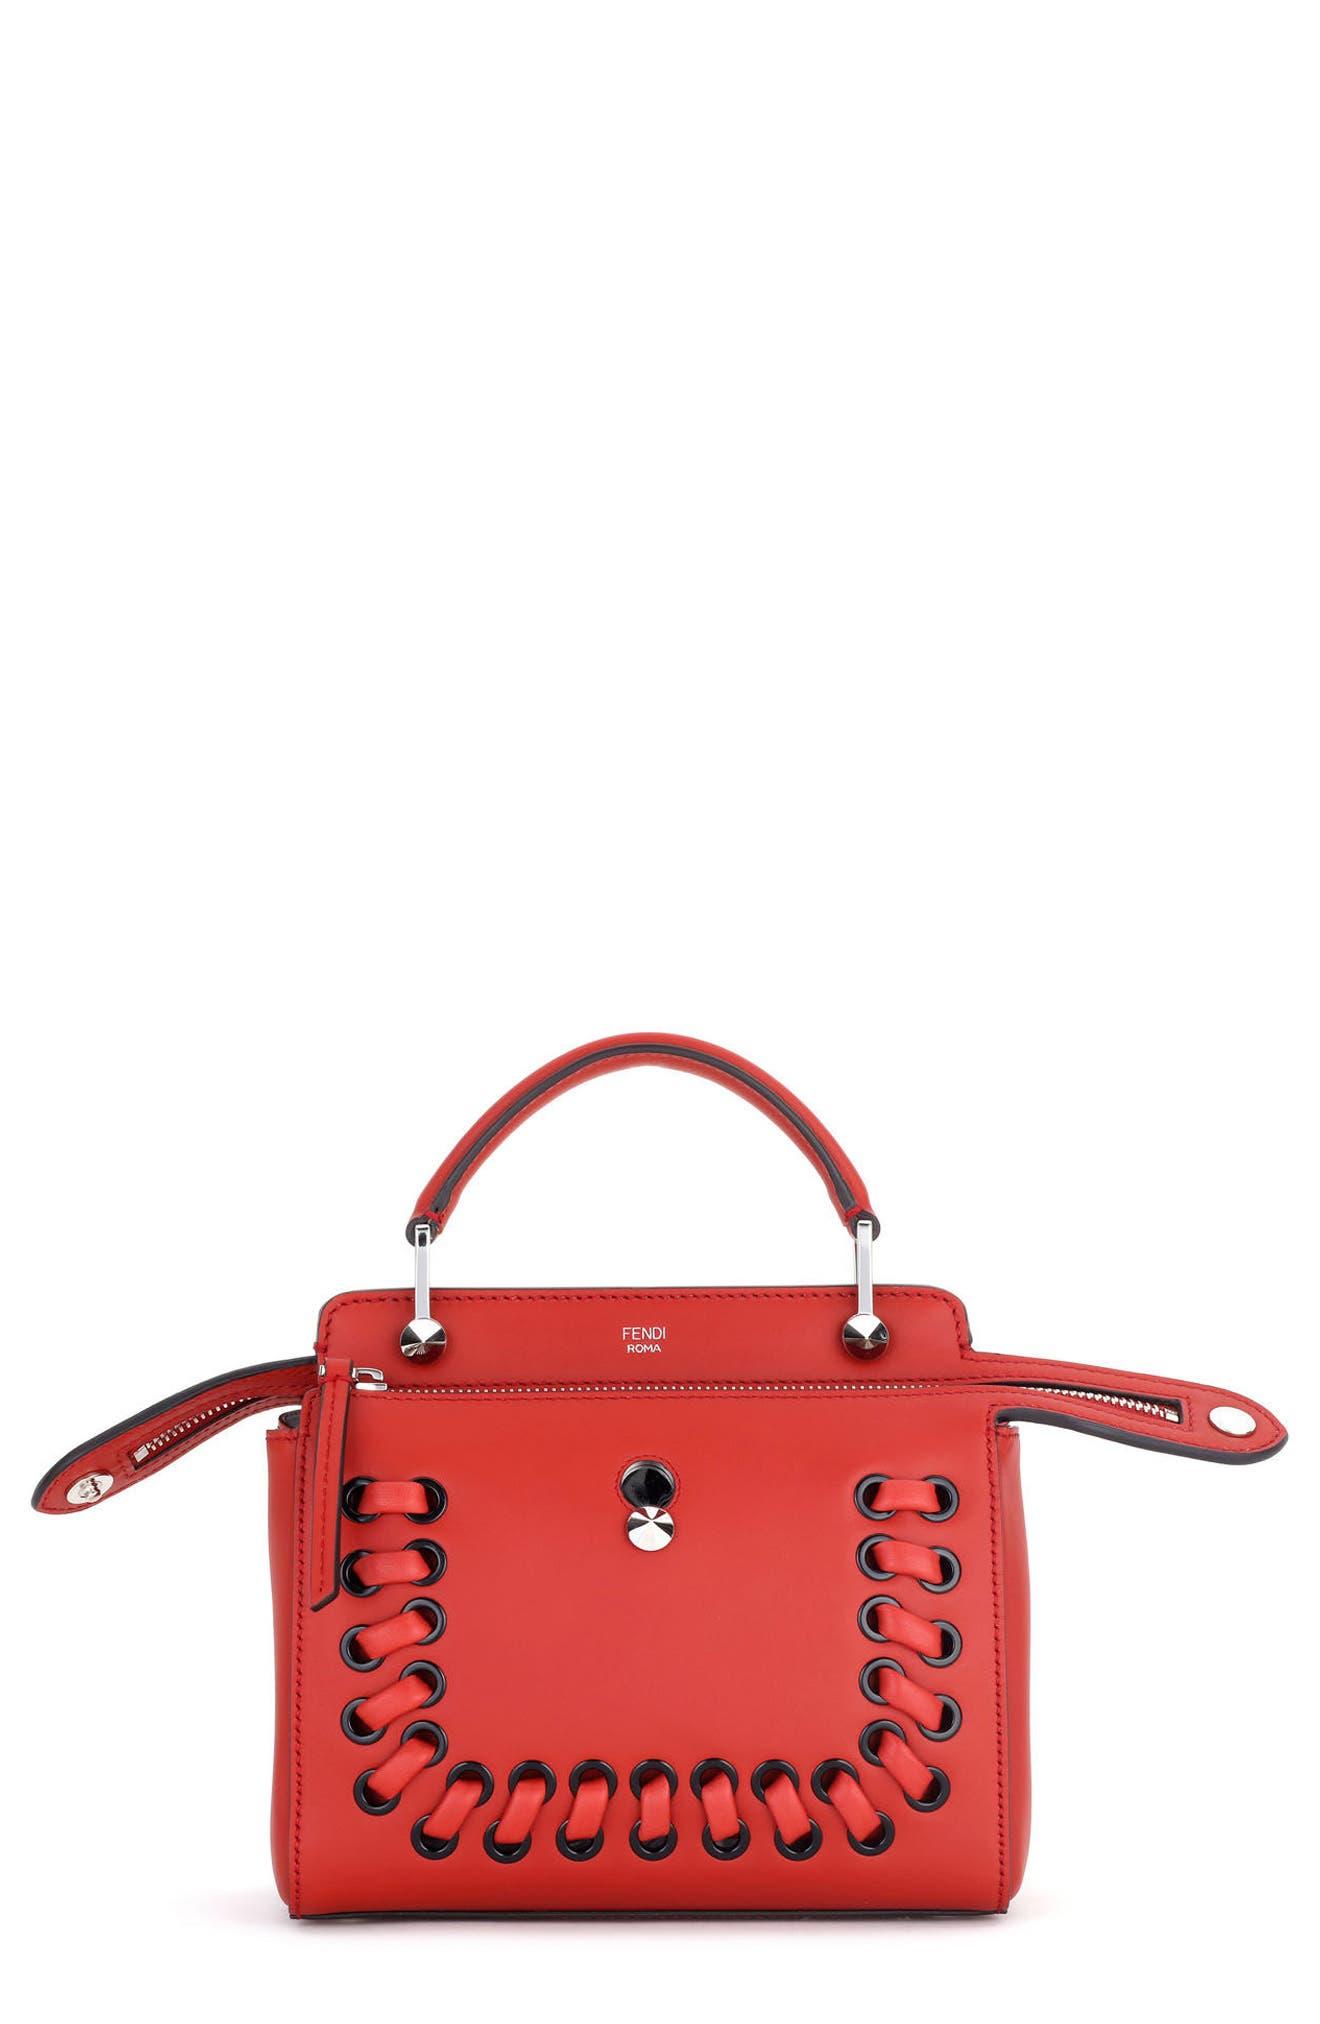 FENDI Dotcom Click Lace-Up Leather Satchel